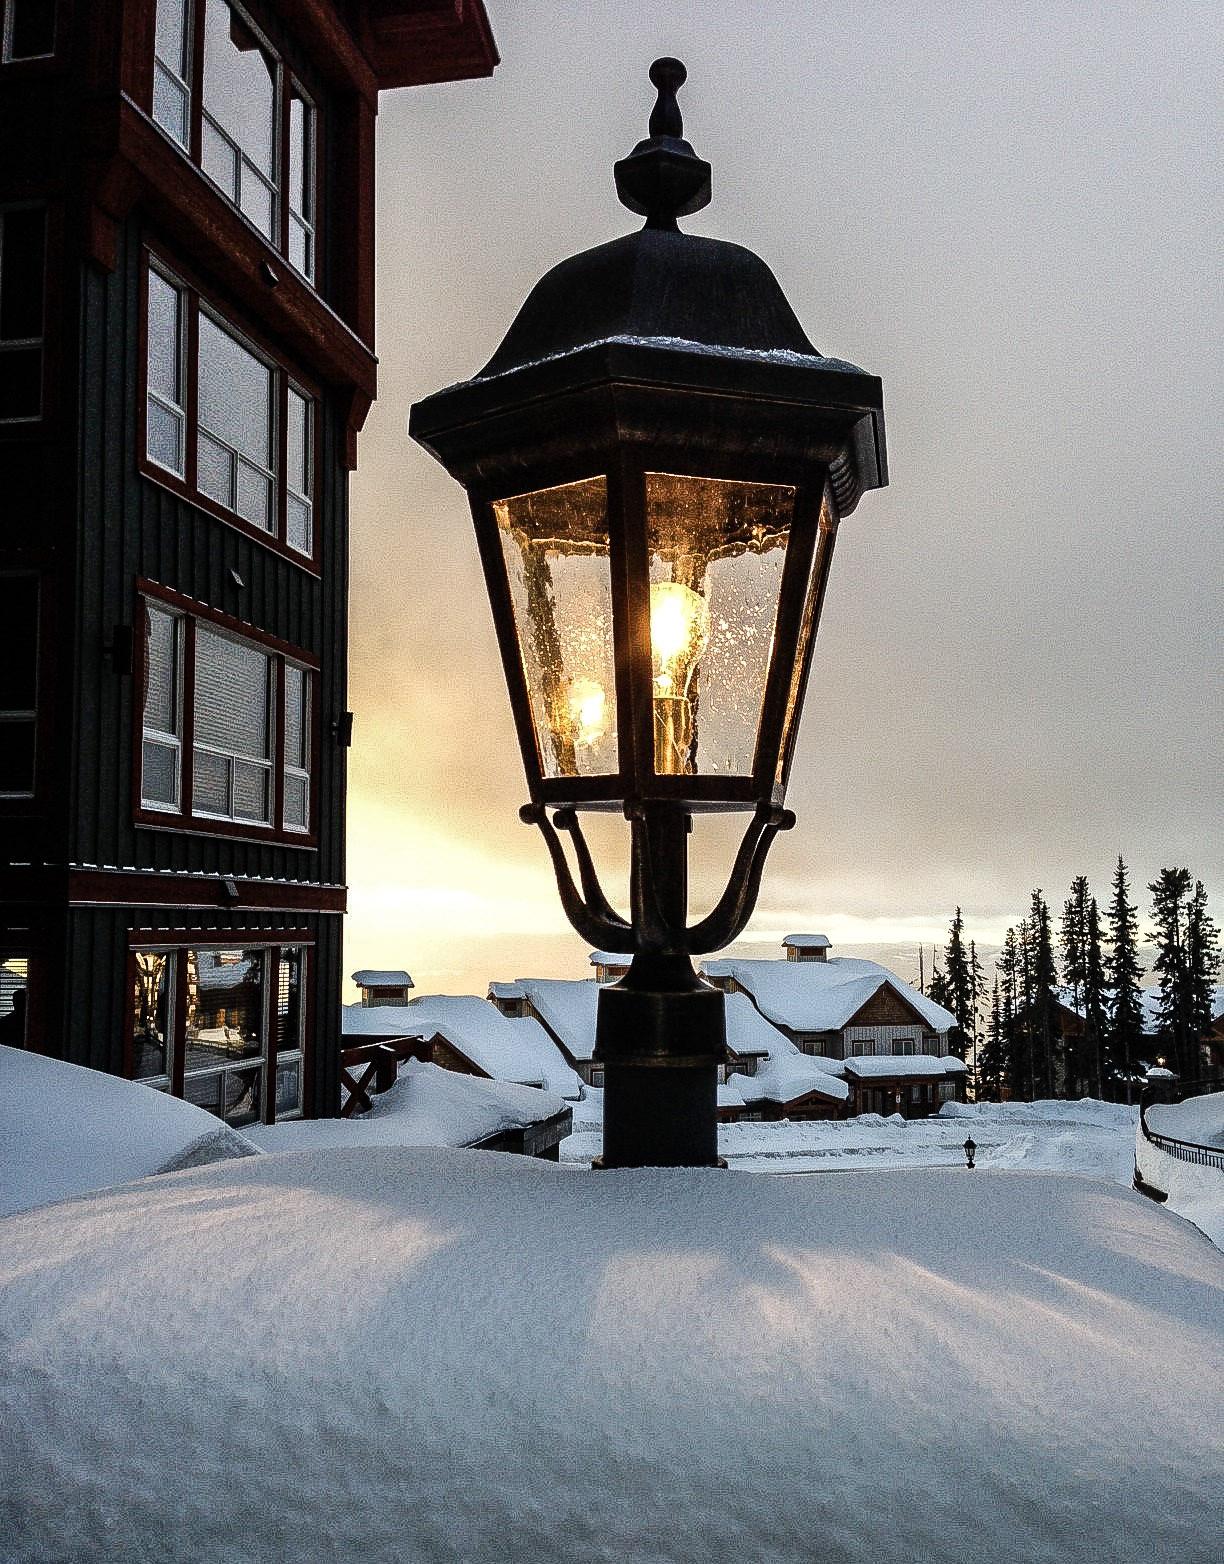 snow accumulates around the lamps at Stonebridge Lodge